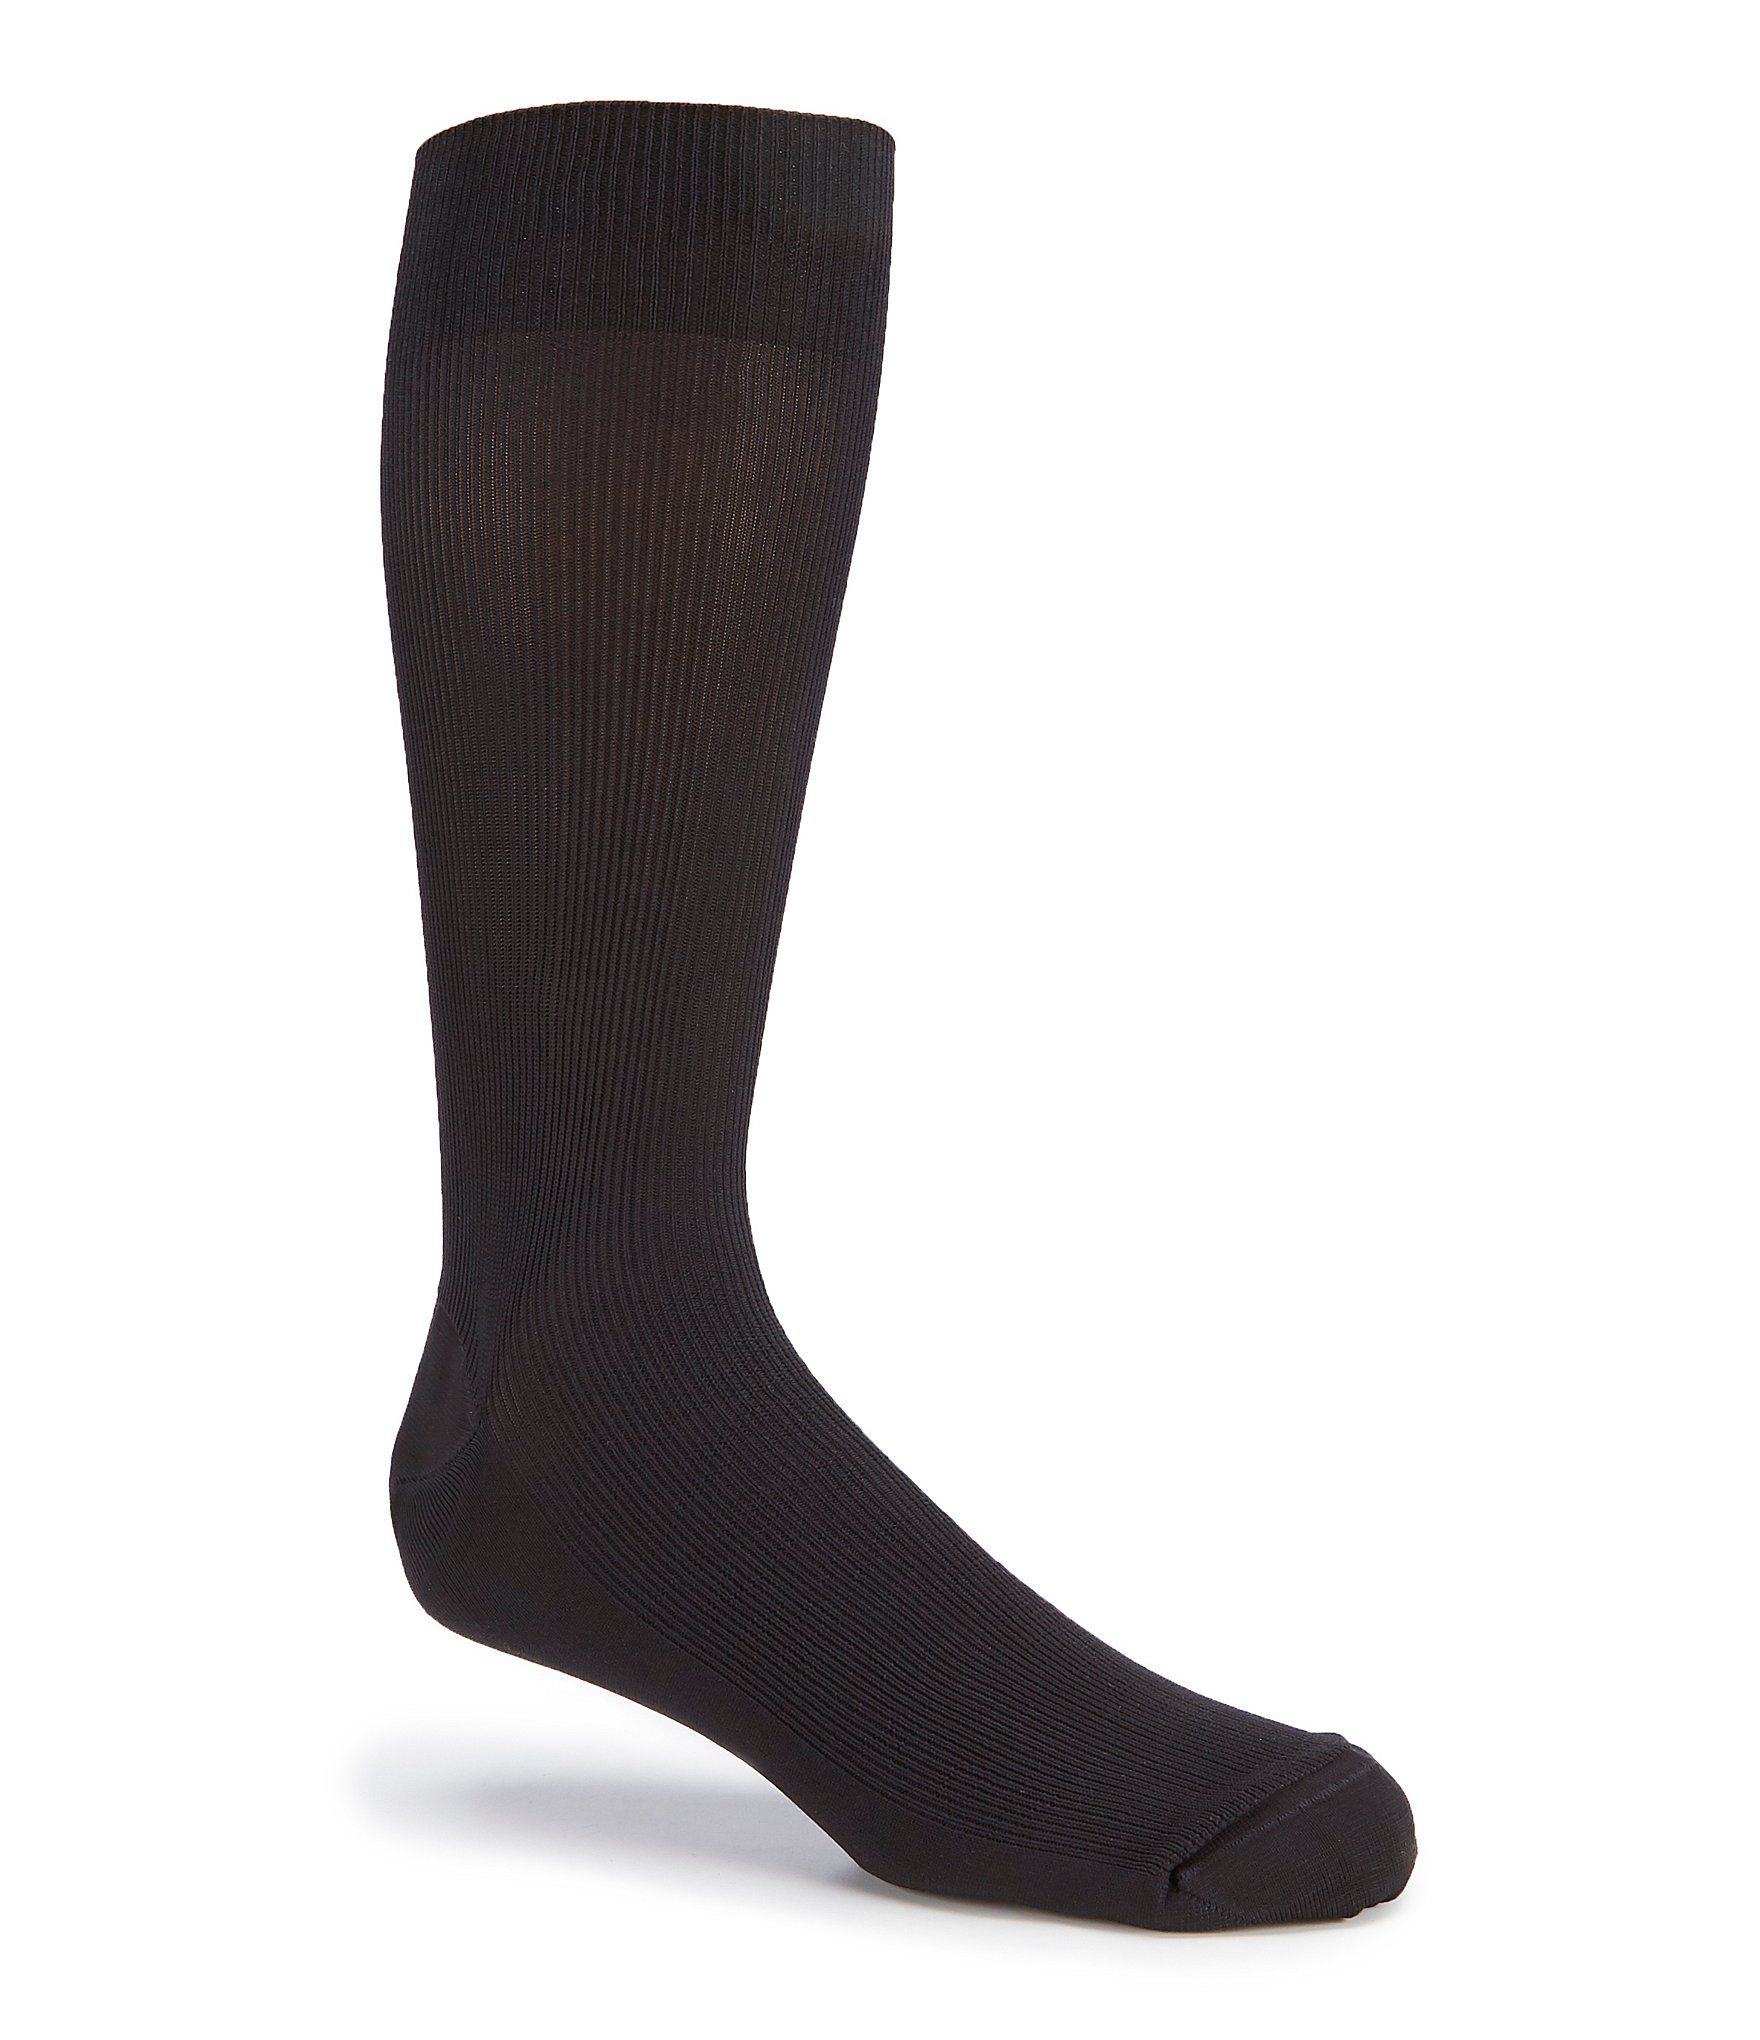 Gold Label Roundtree  Yorke Big  Tall Rib Crew Socks 3-Pack - Black N/A